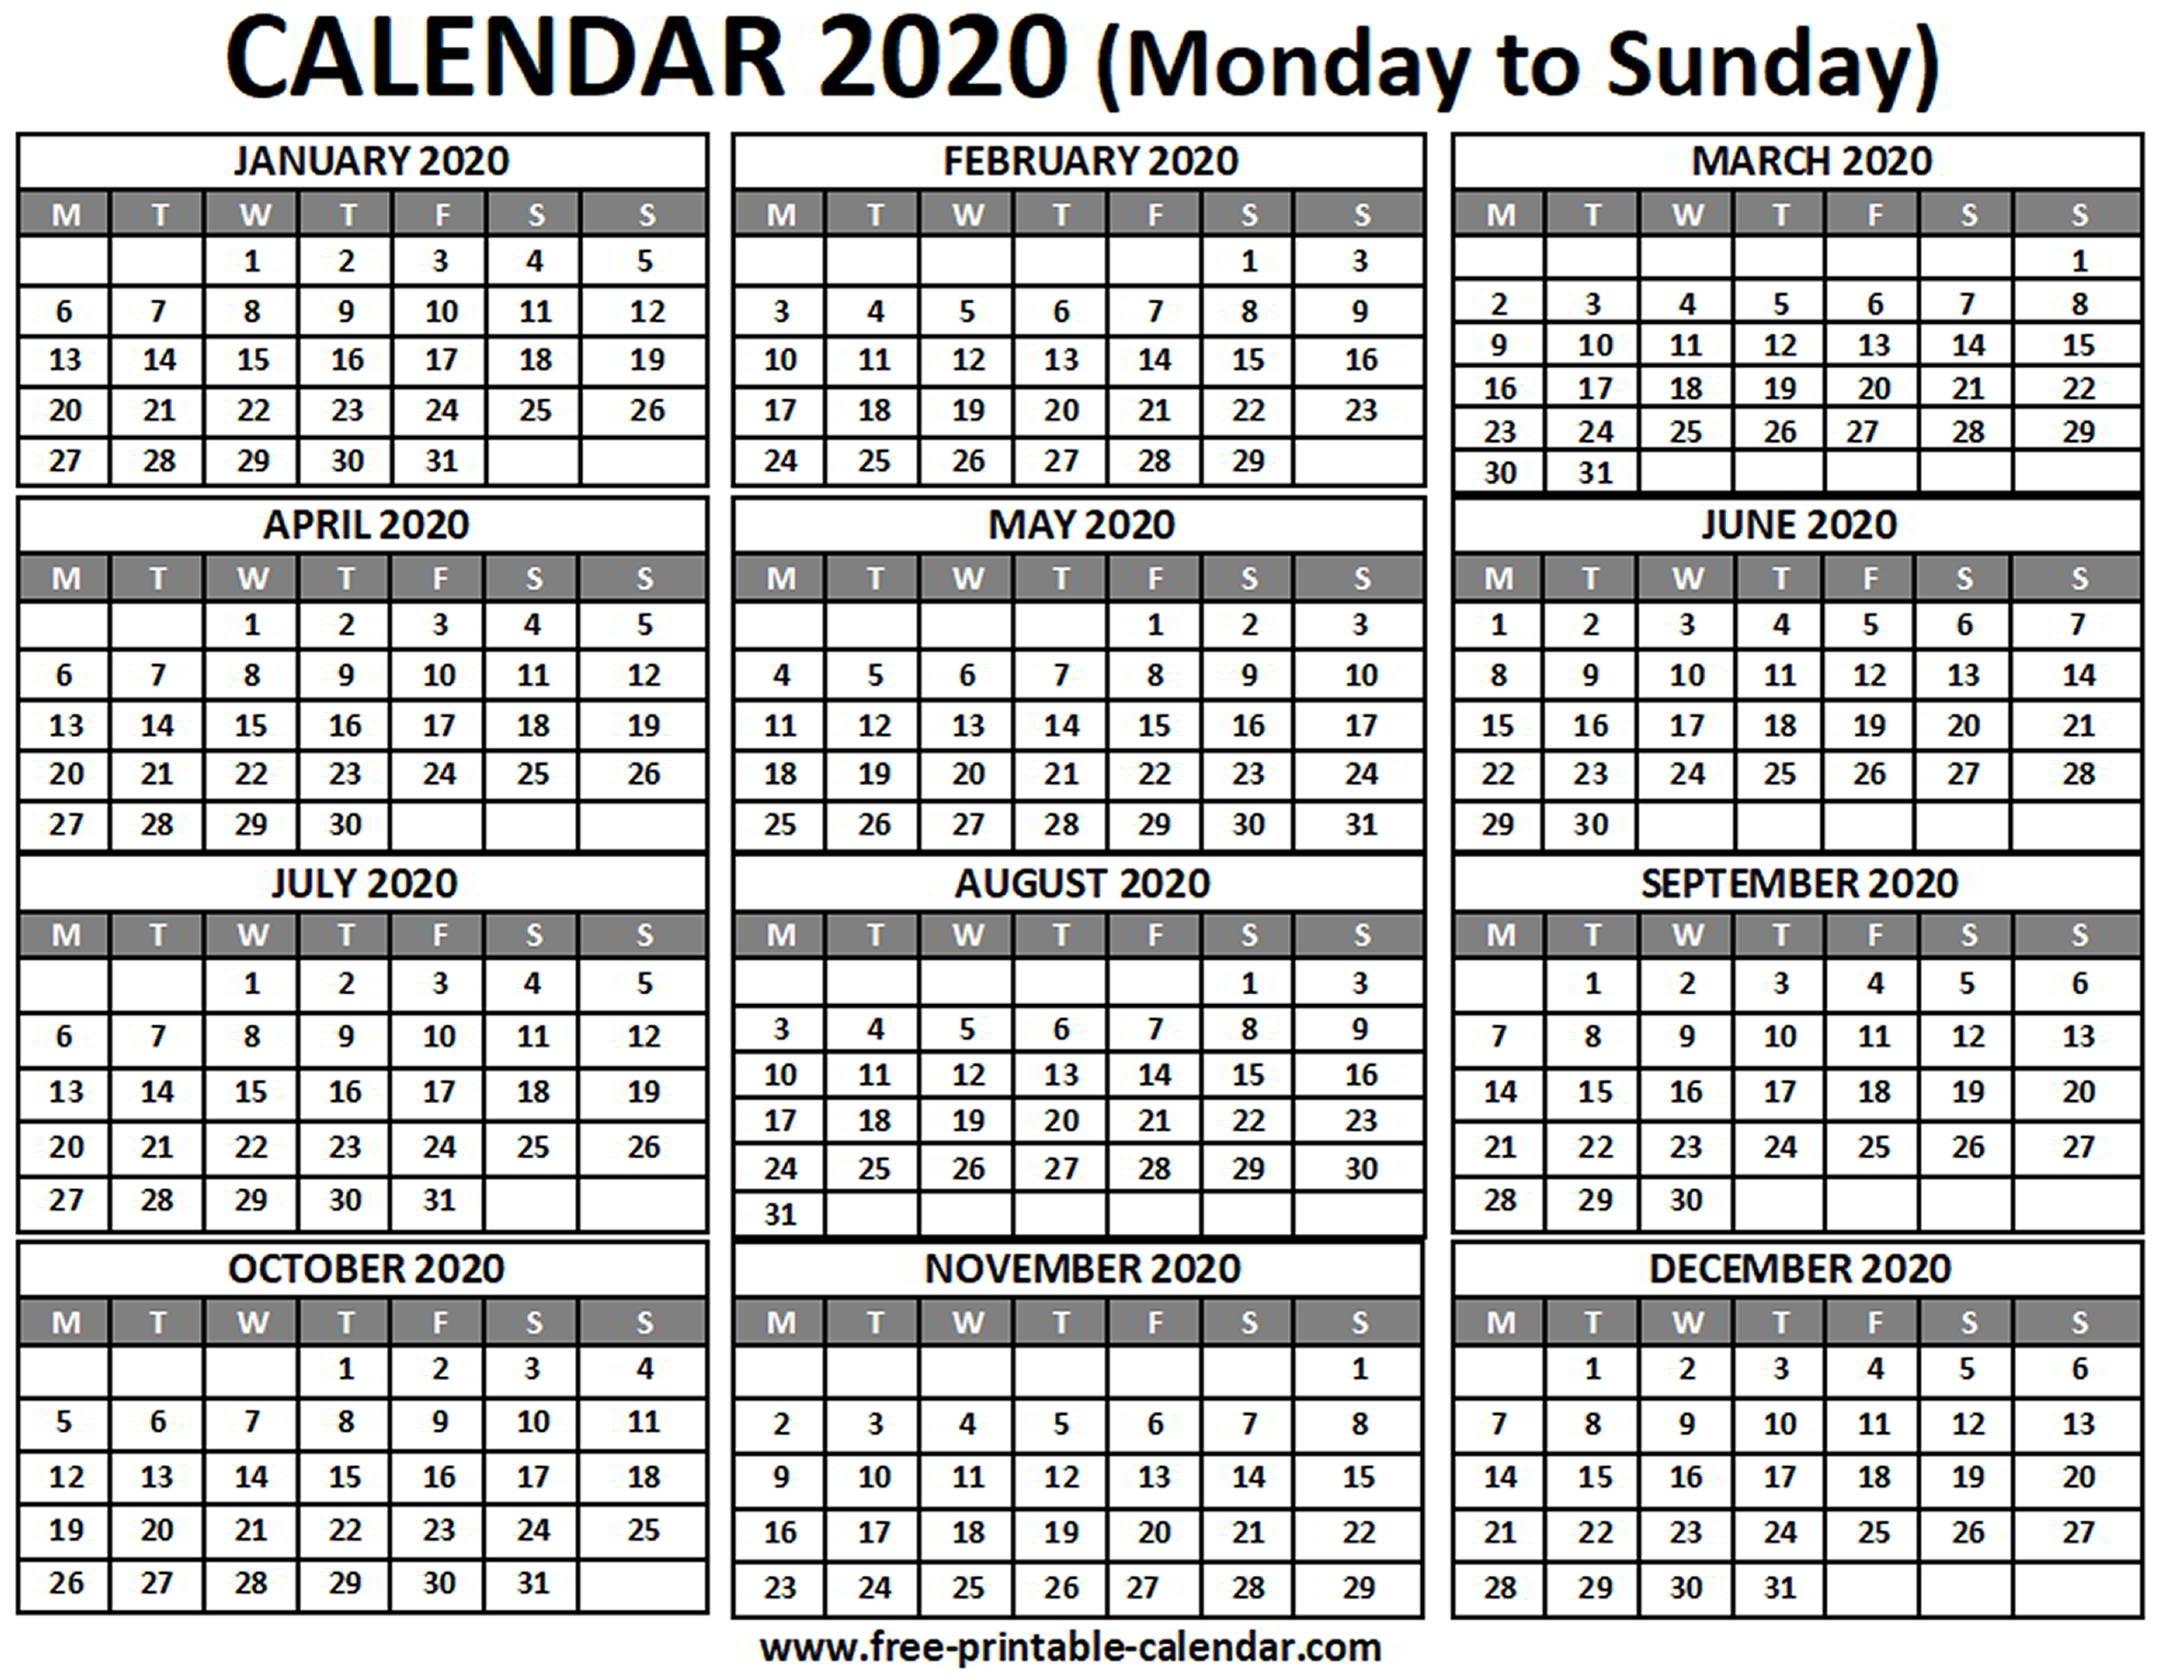 2020 Calendar - Free-Printable-Calendar with regard to Free 2020 Calendar Starting With Monday